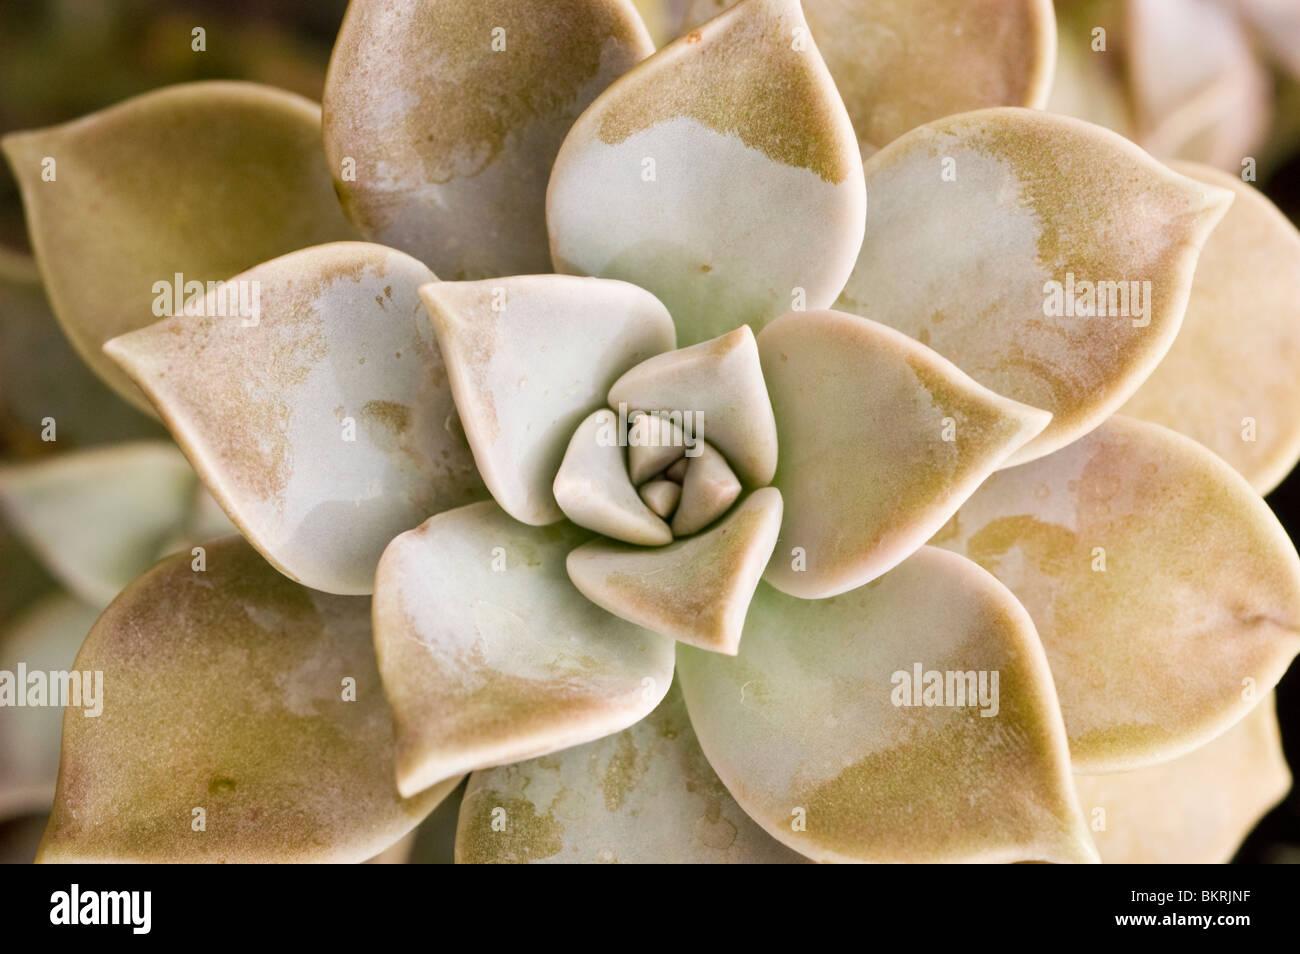 Impianto di Ghost, piante succulente, Graptopetalum paraguayense, Sedum weinbergii,, Piante succulente | Dicotiledoni, Immagini Stock